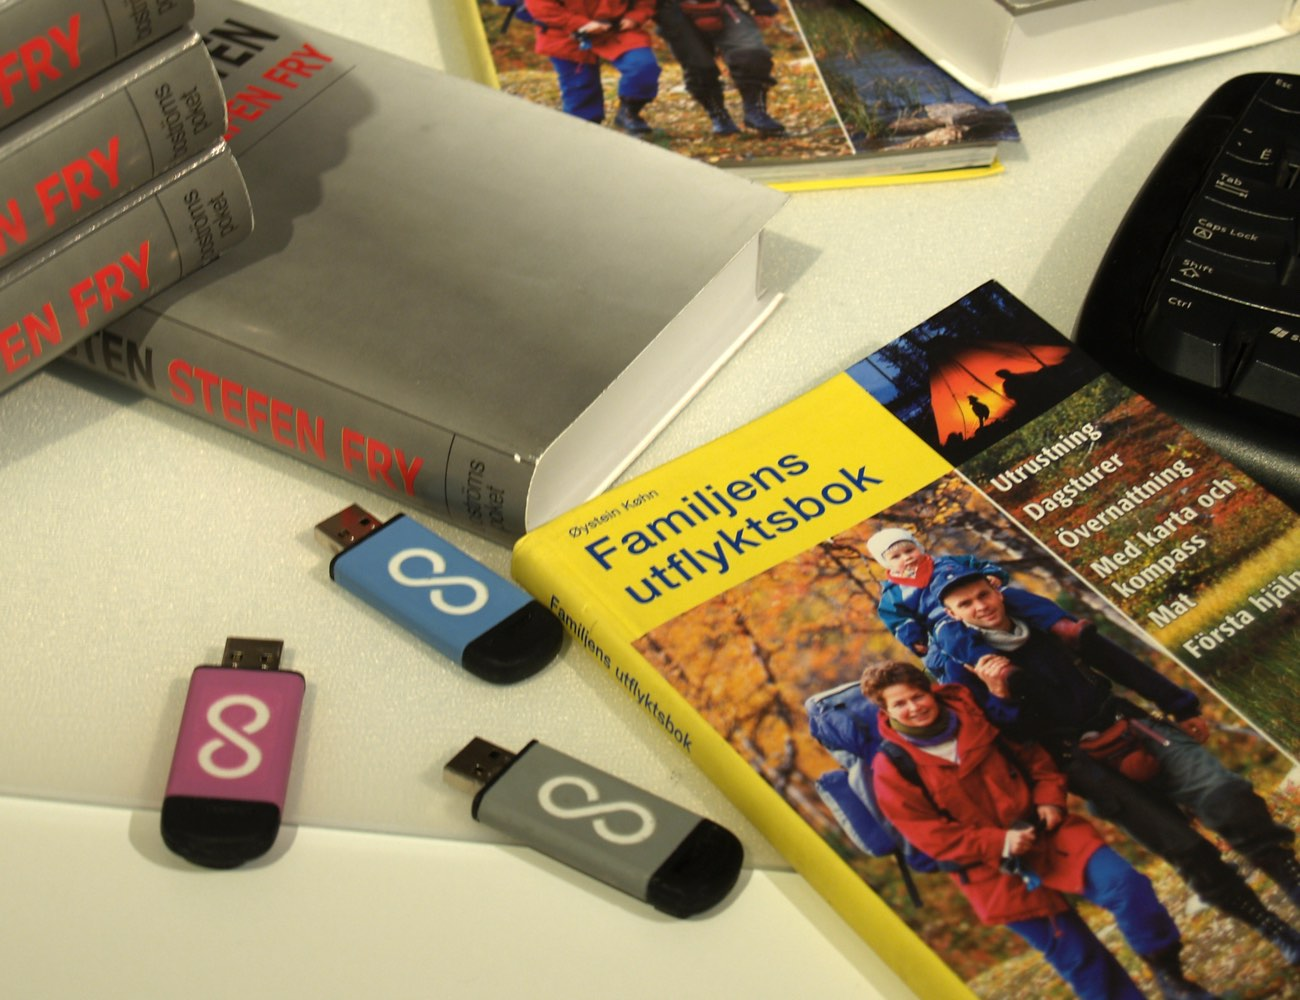 Flashsafe – World's first unlimited SmartFlash 4G